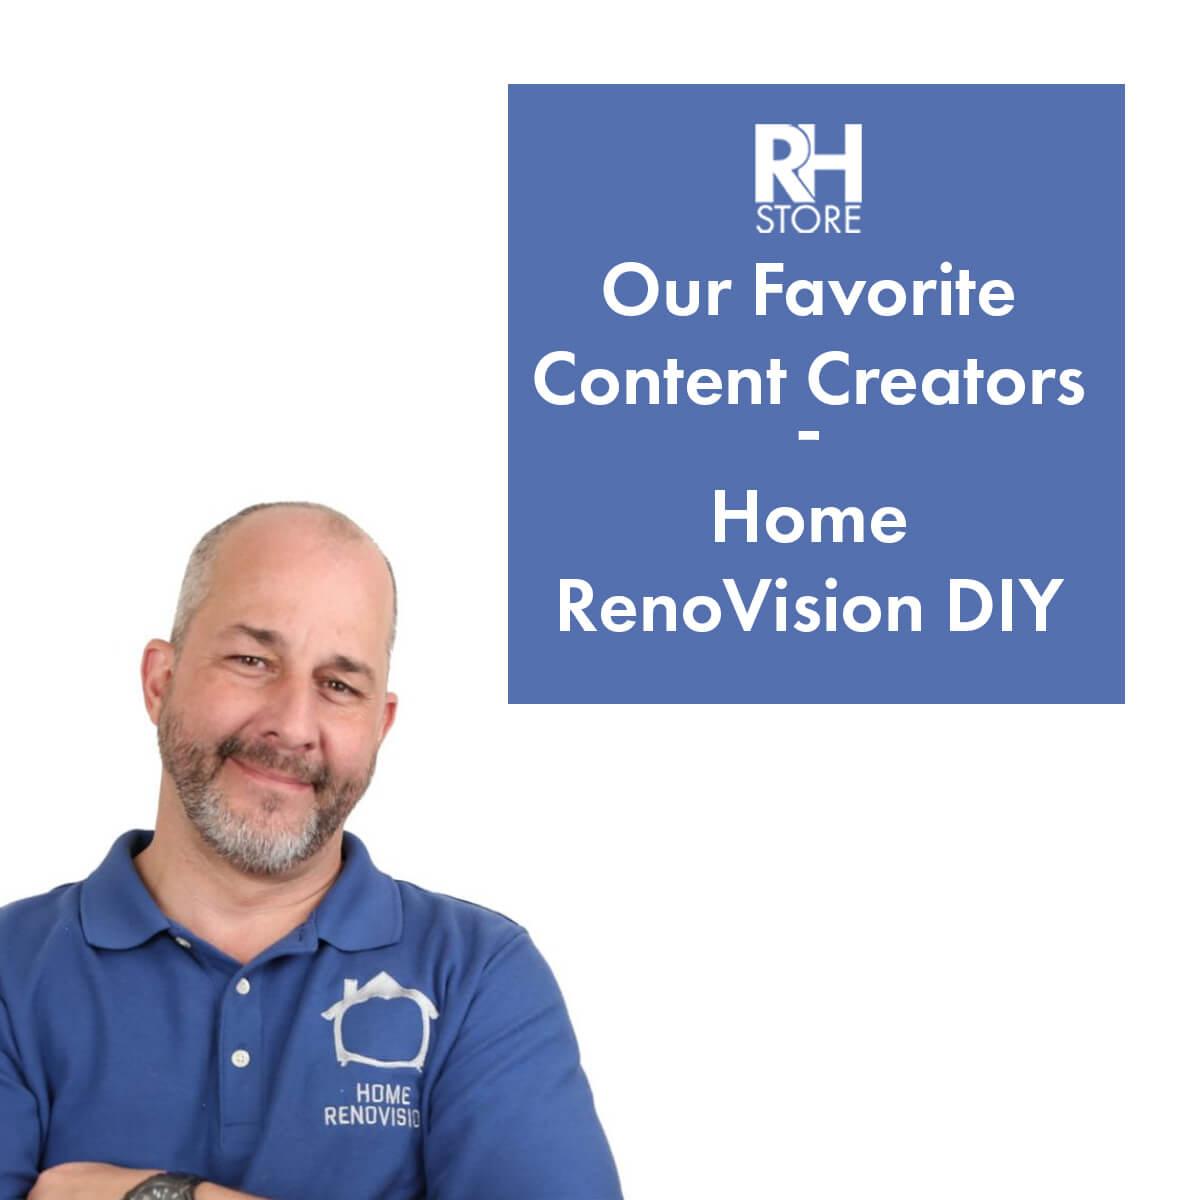 Our Favorite Content Creators - Home RenoVision DIY